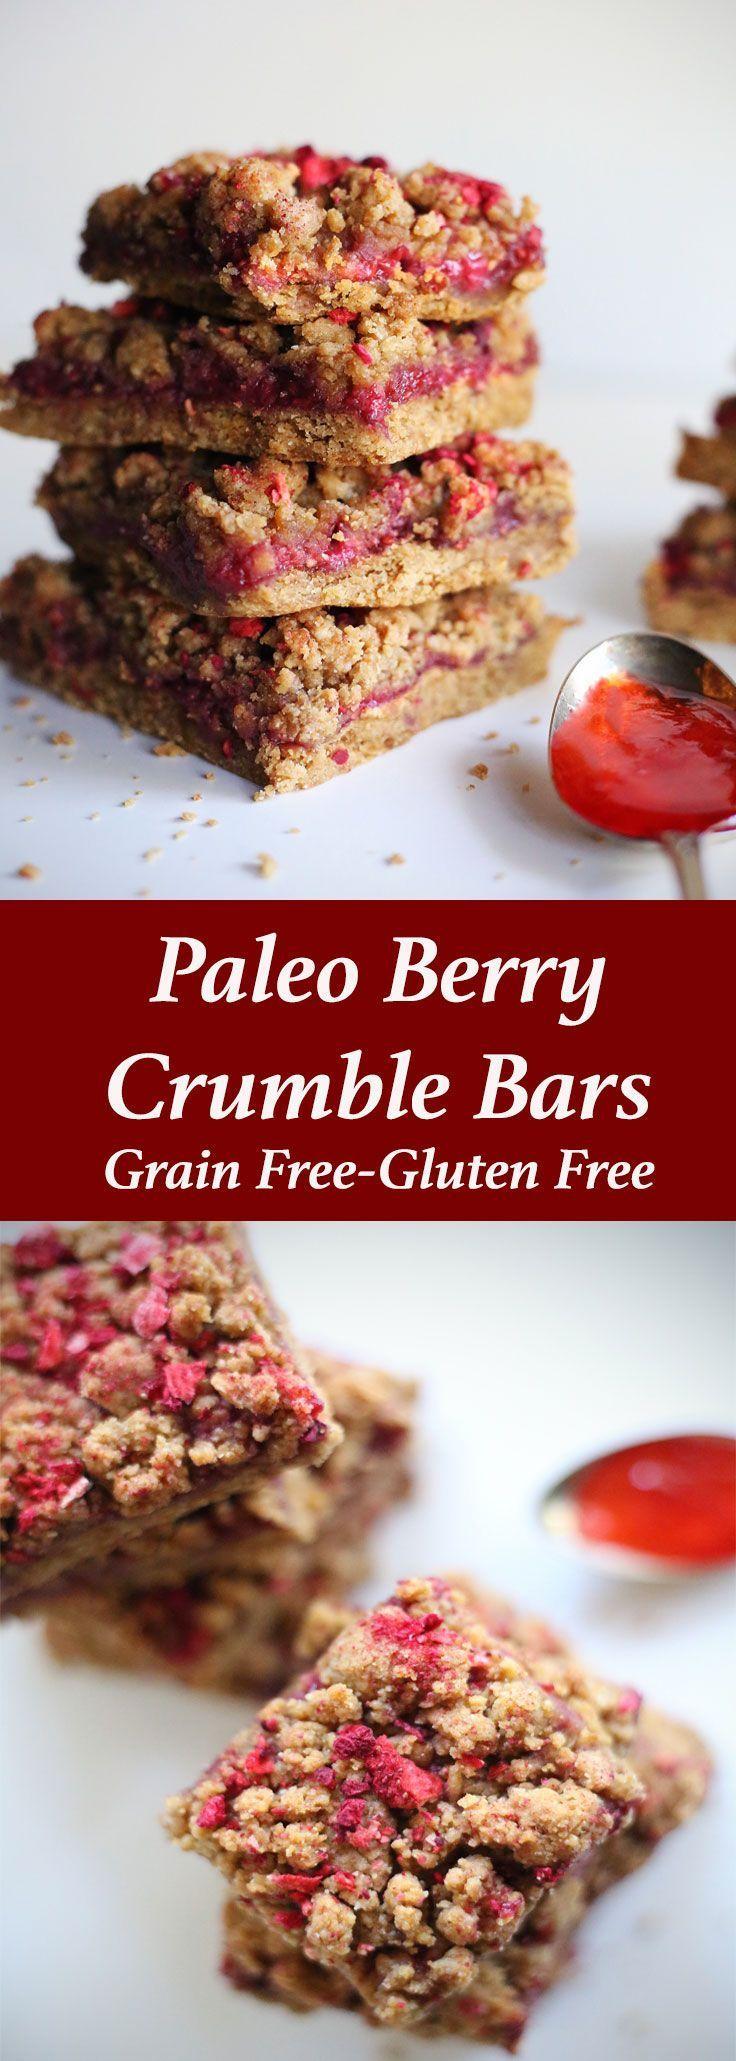 Paleo Berry Crumble Bars - The Paleo Paparazzi